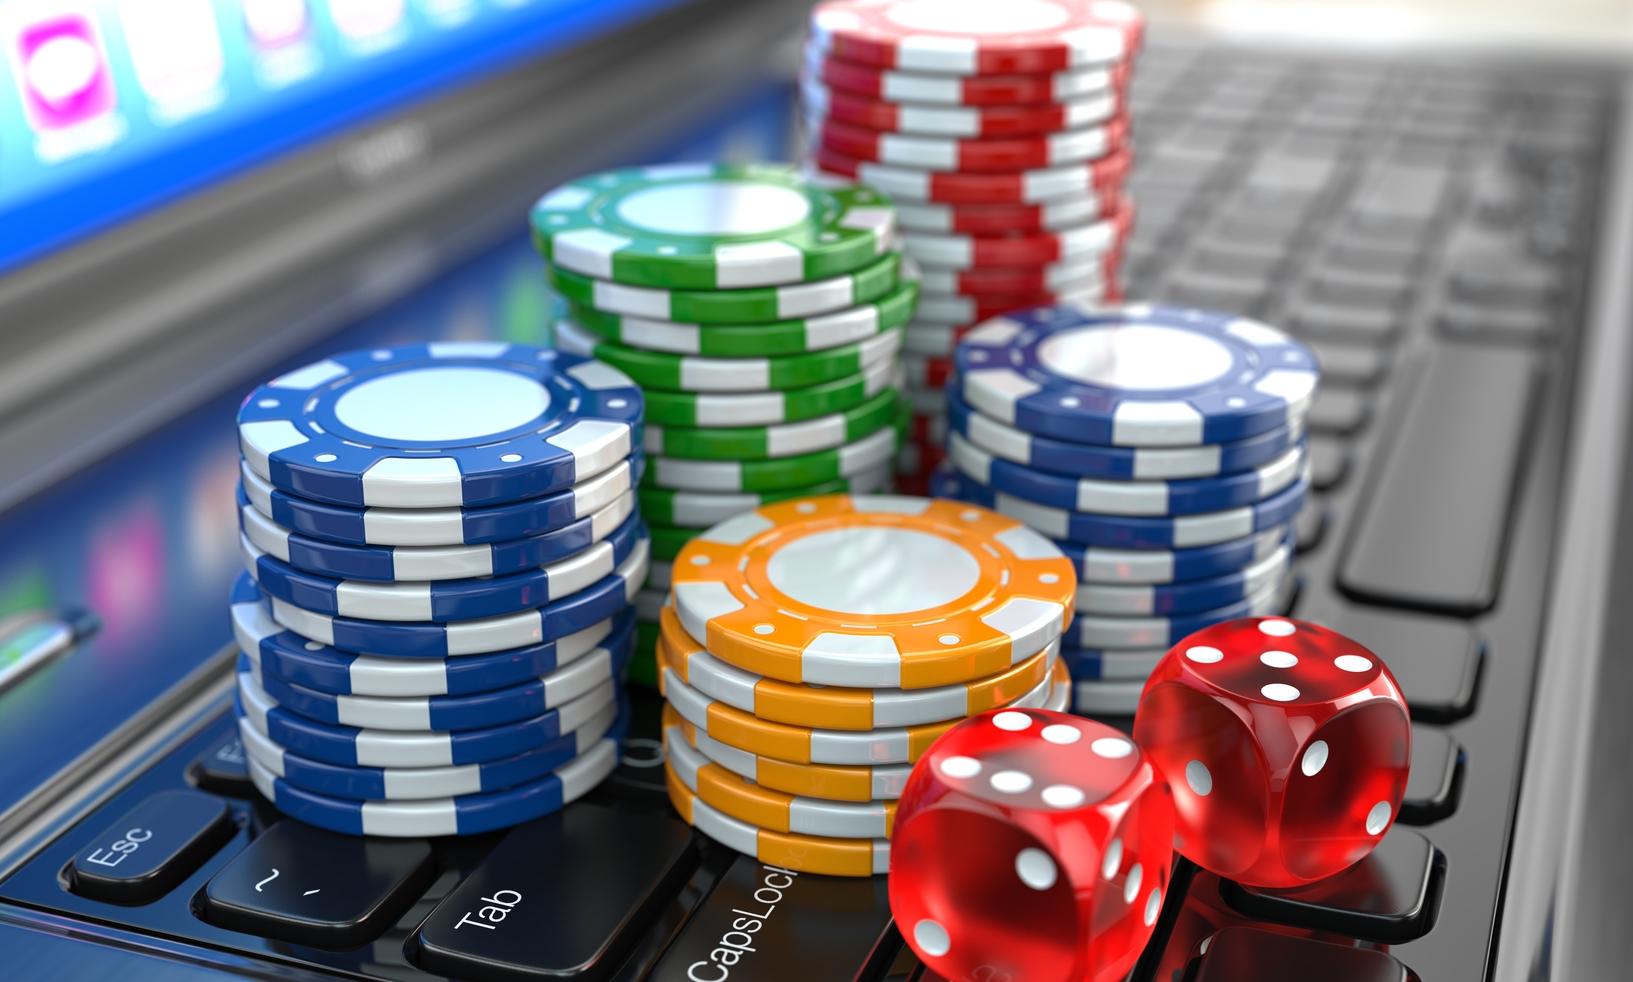 top10 offers revshare gambling betting 3snet